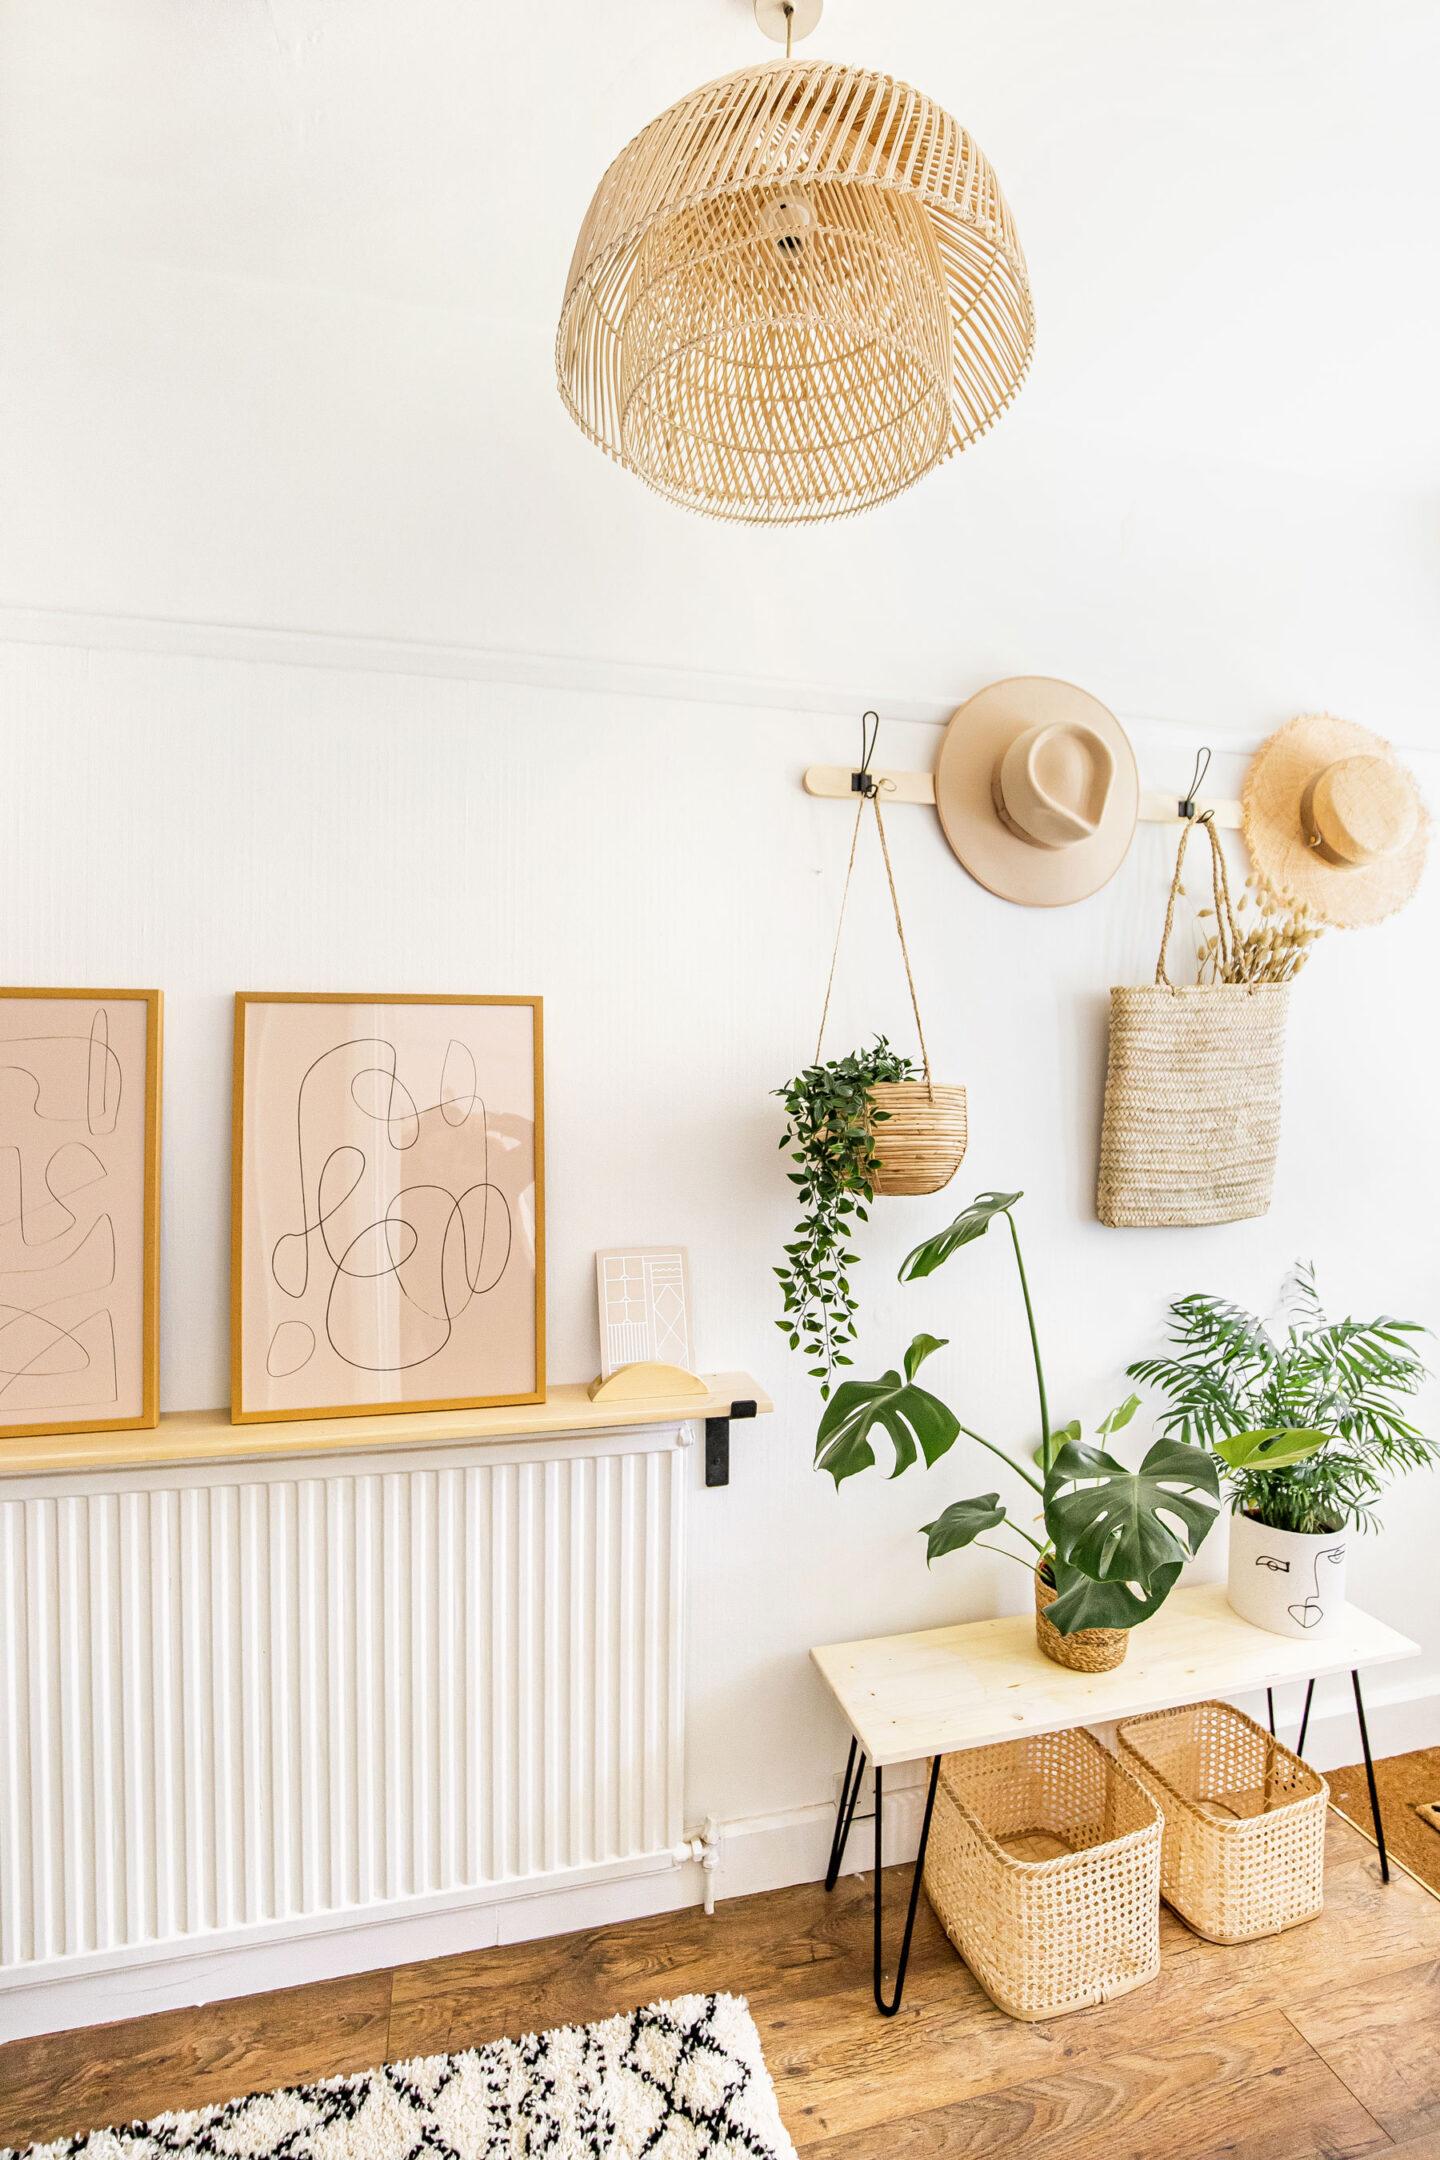 2-Hallway-Decorating-Ideas-kelseyinlondon-homewithkelsey-interior-decorating